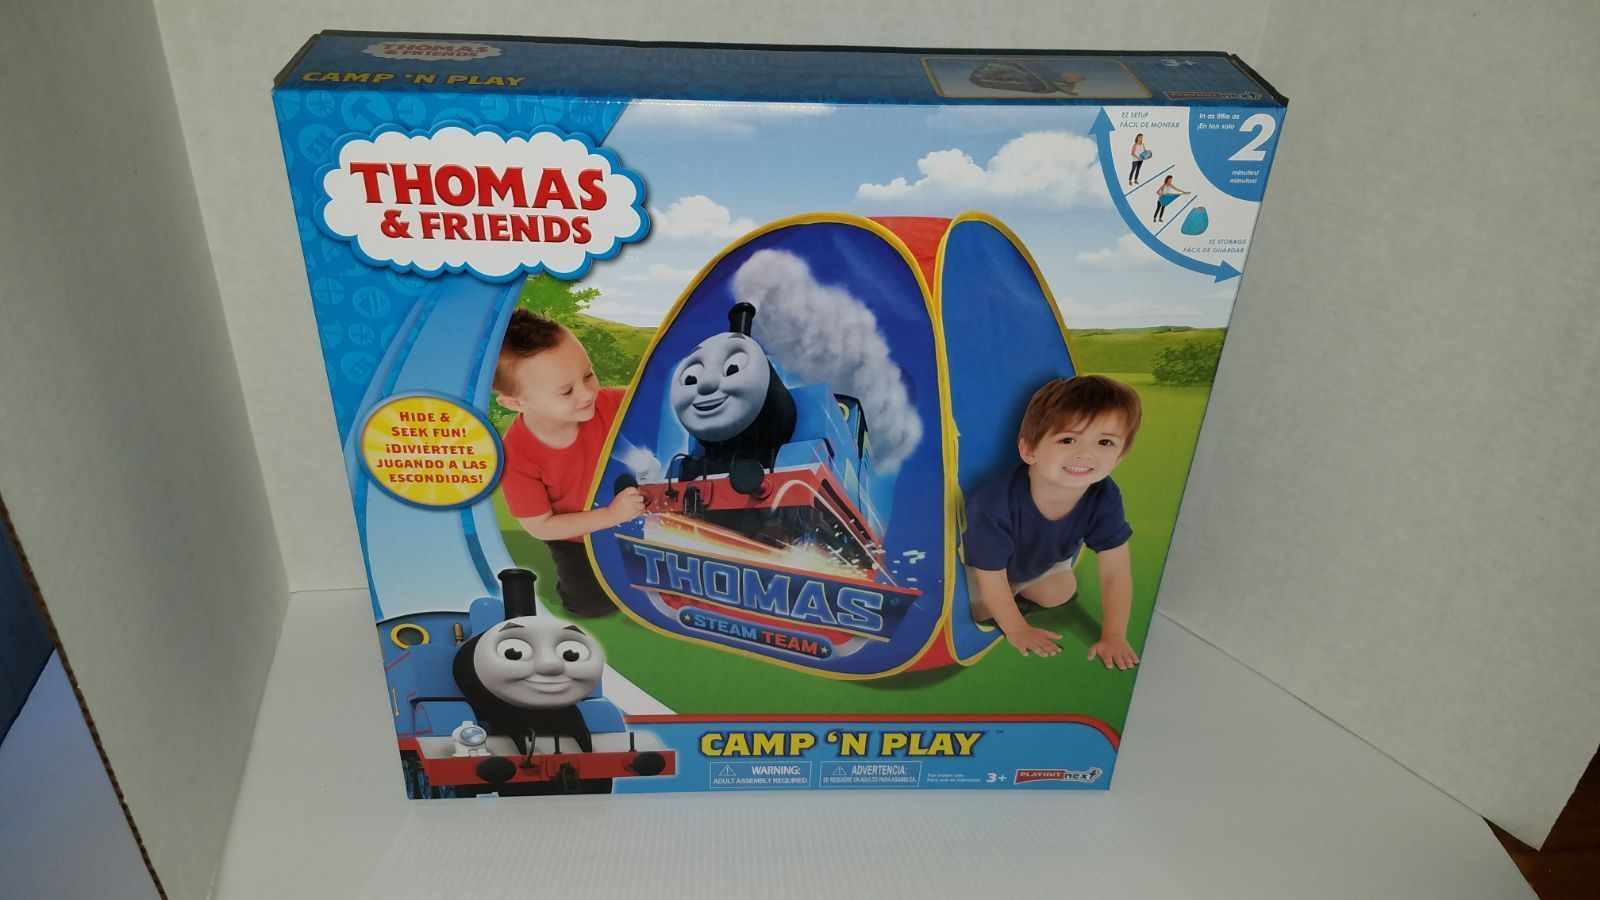 Thomas u0026 Friends Pop Up Tent  sc 1 st  Mercari & Thomas u0026 Friends Pop Up Tent - Mercari: The Selling App